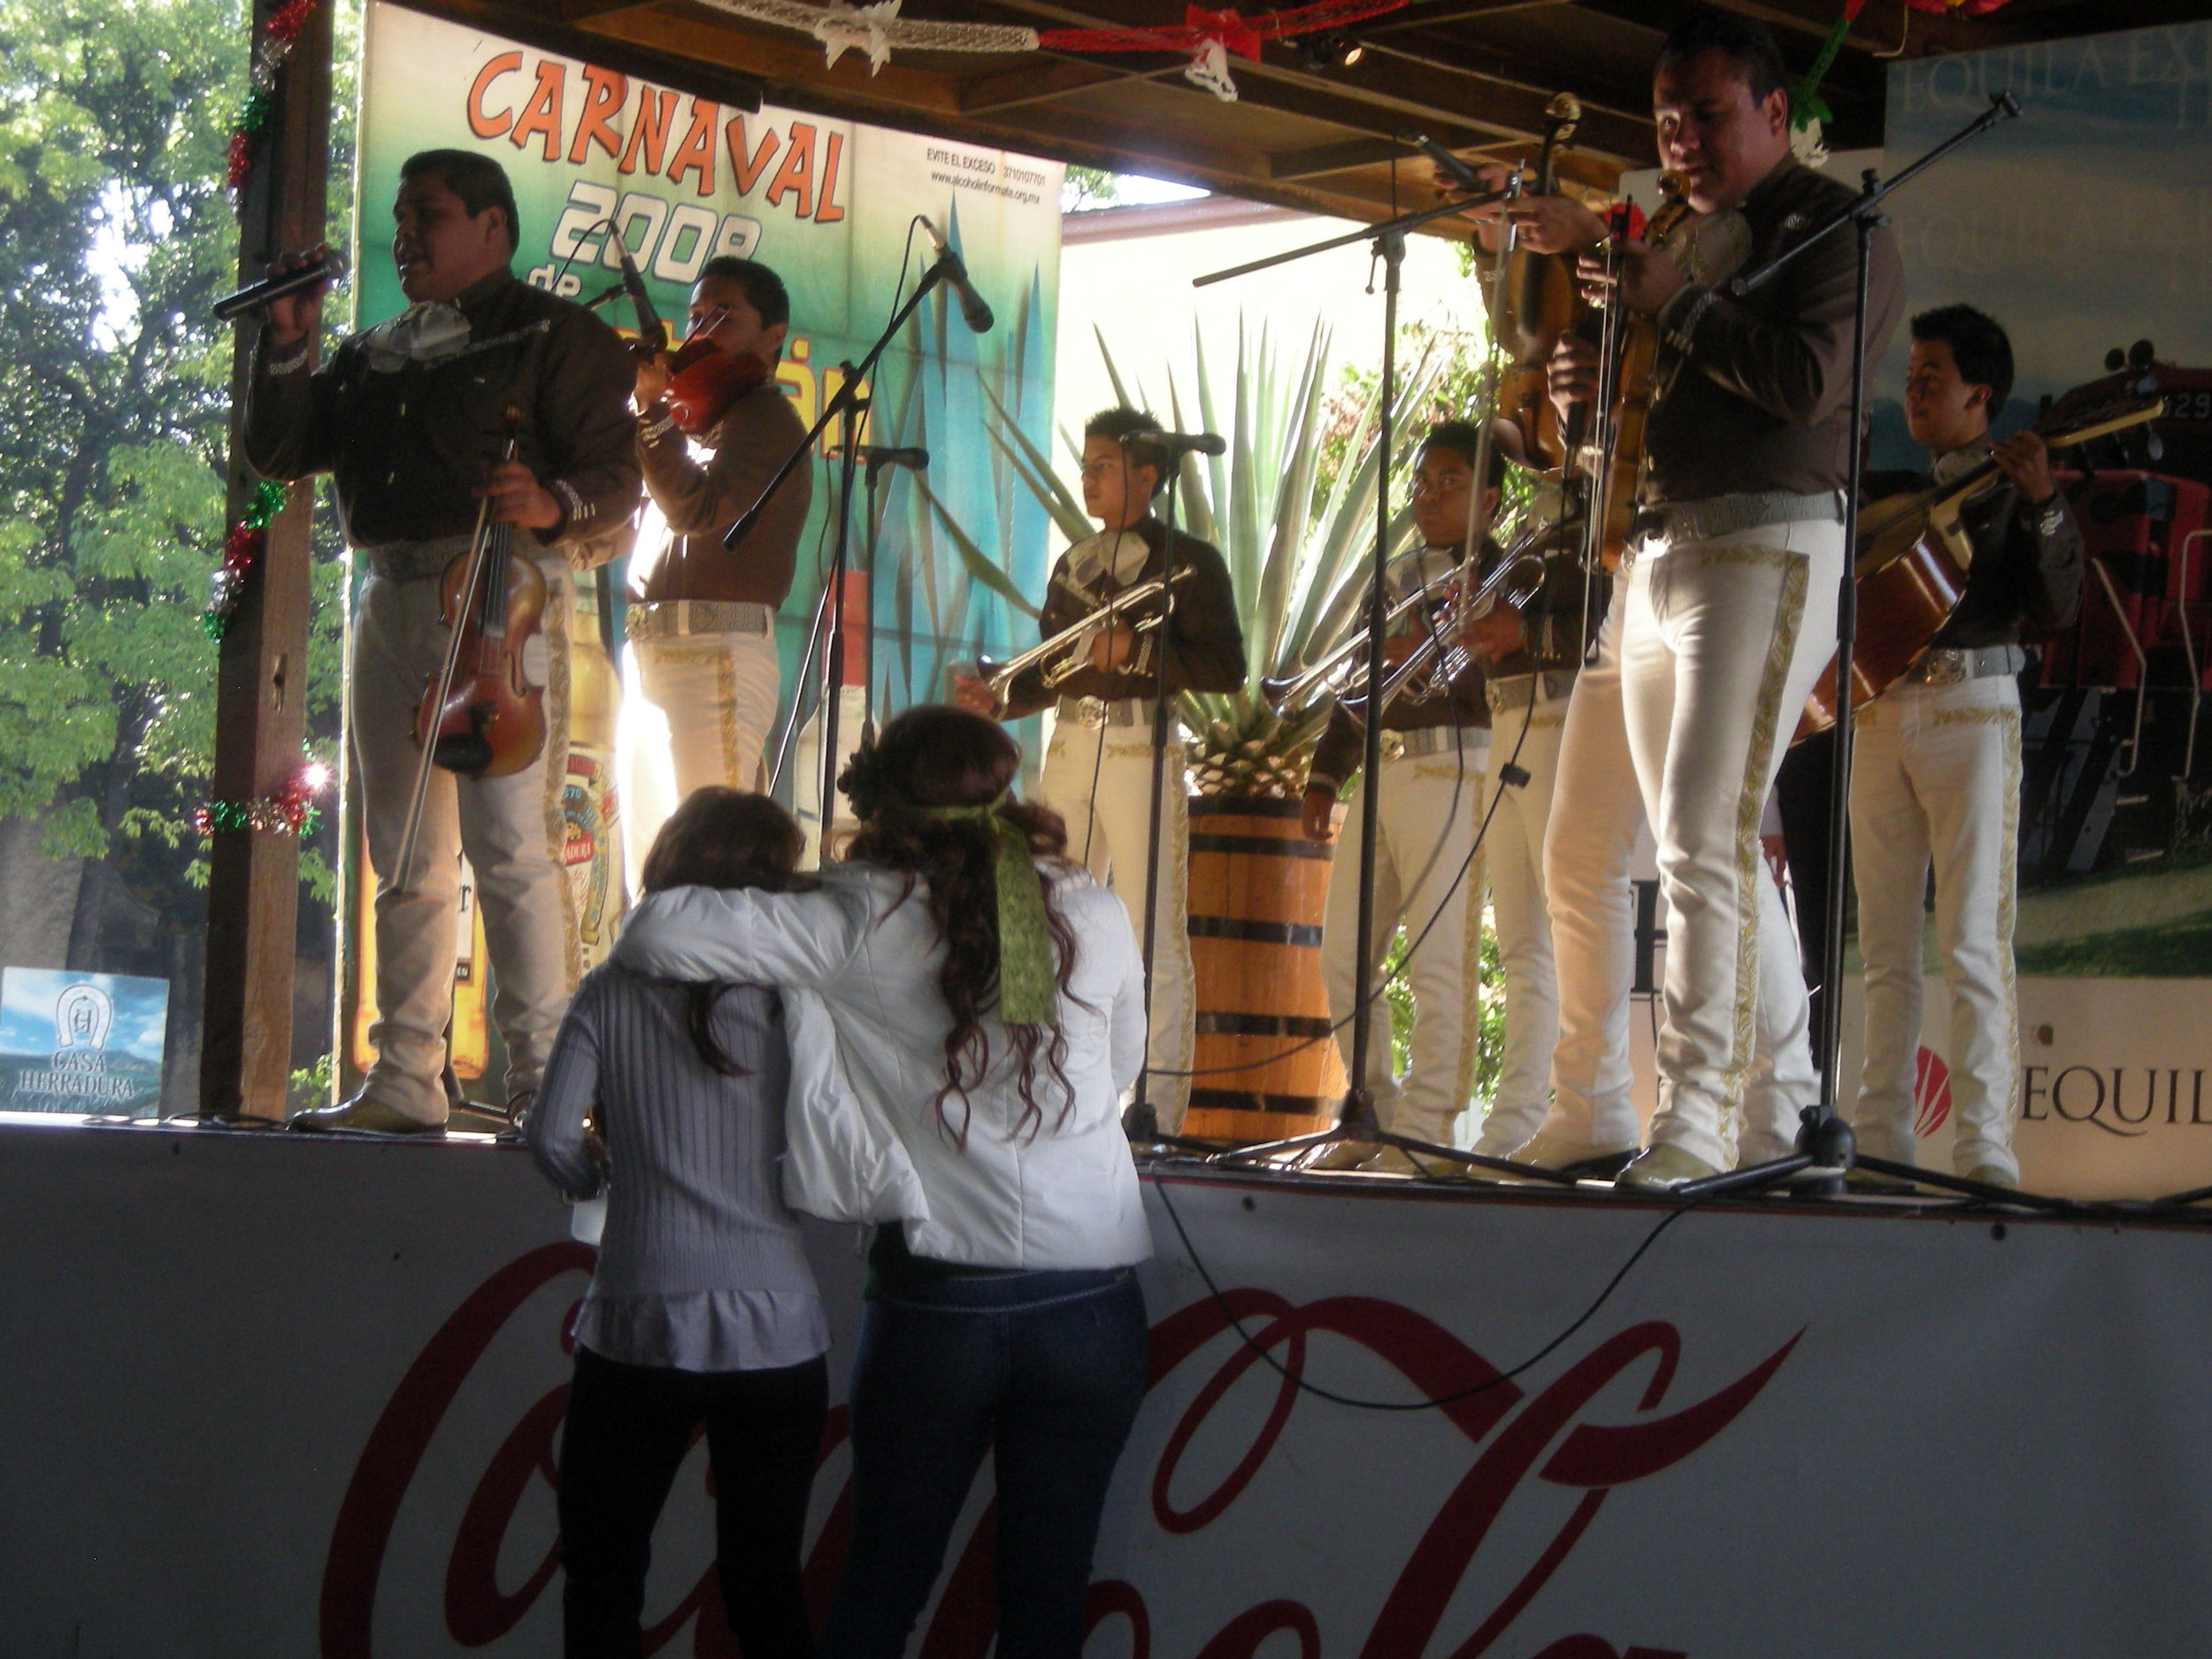 drunken mariachi sluts.jpg